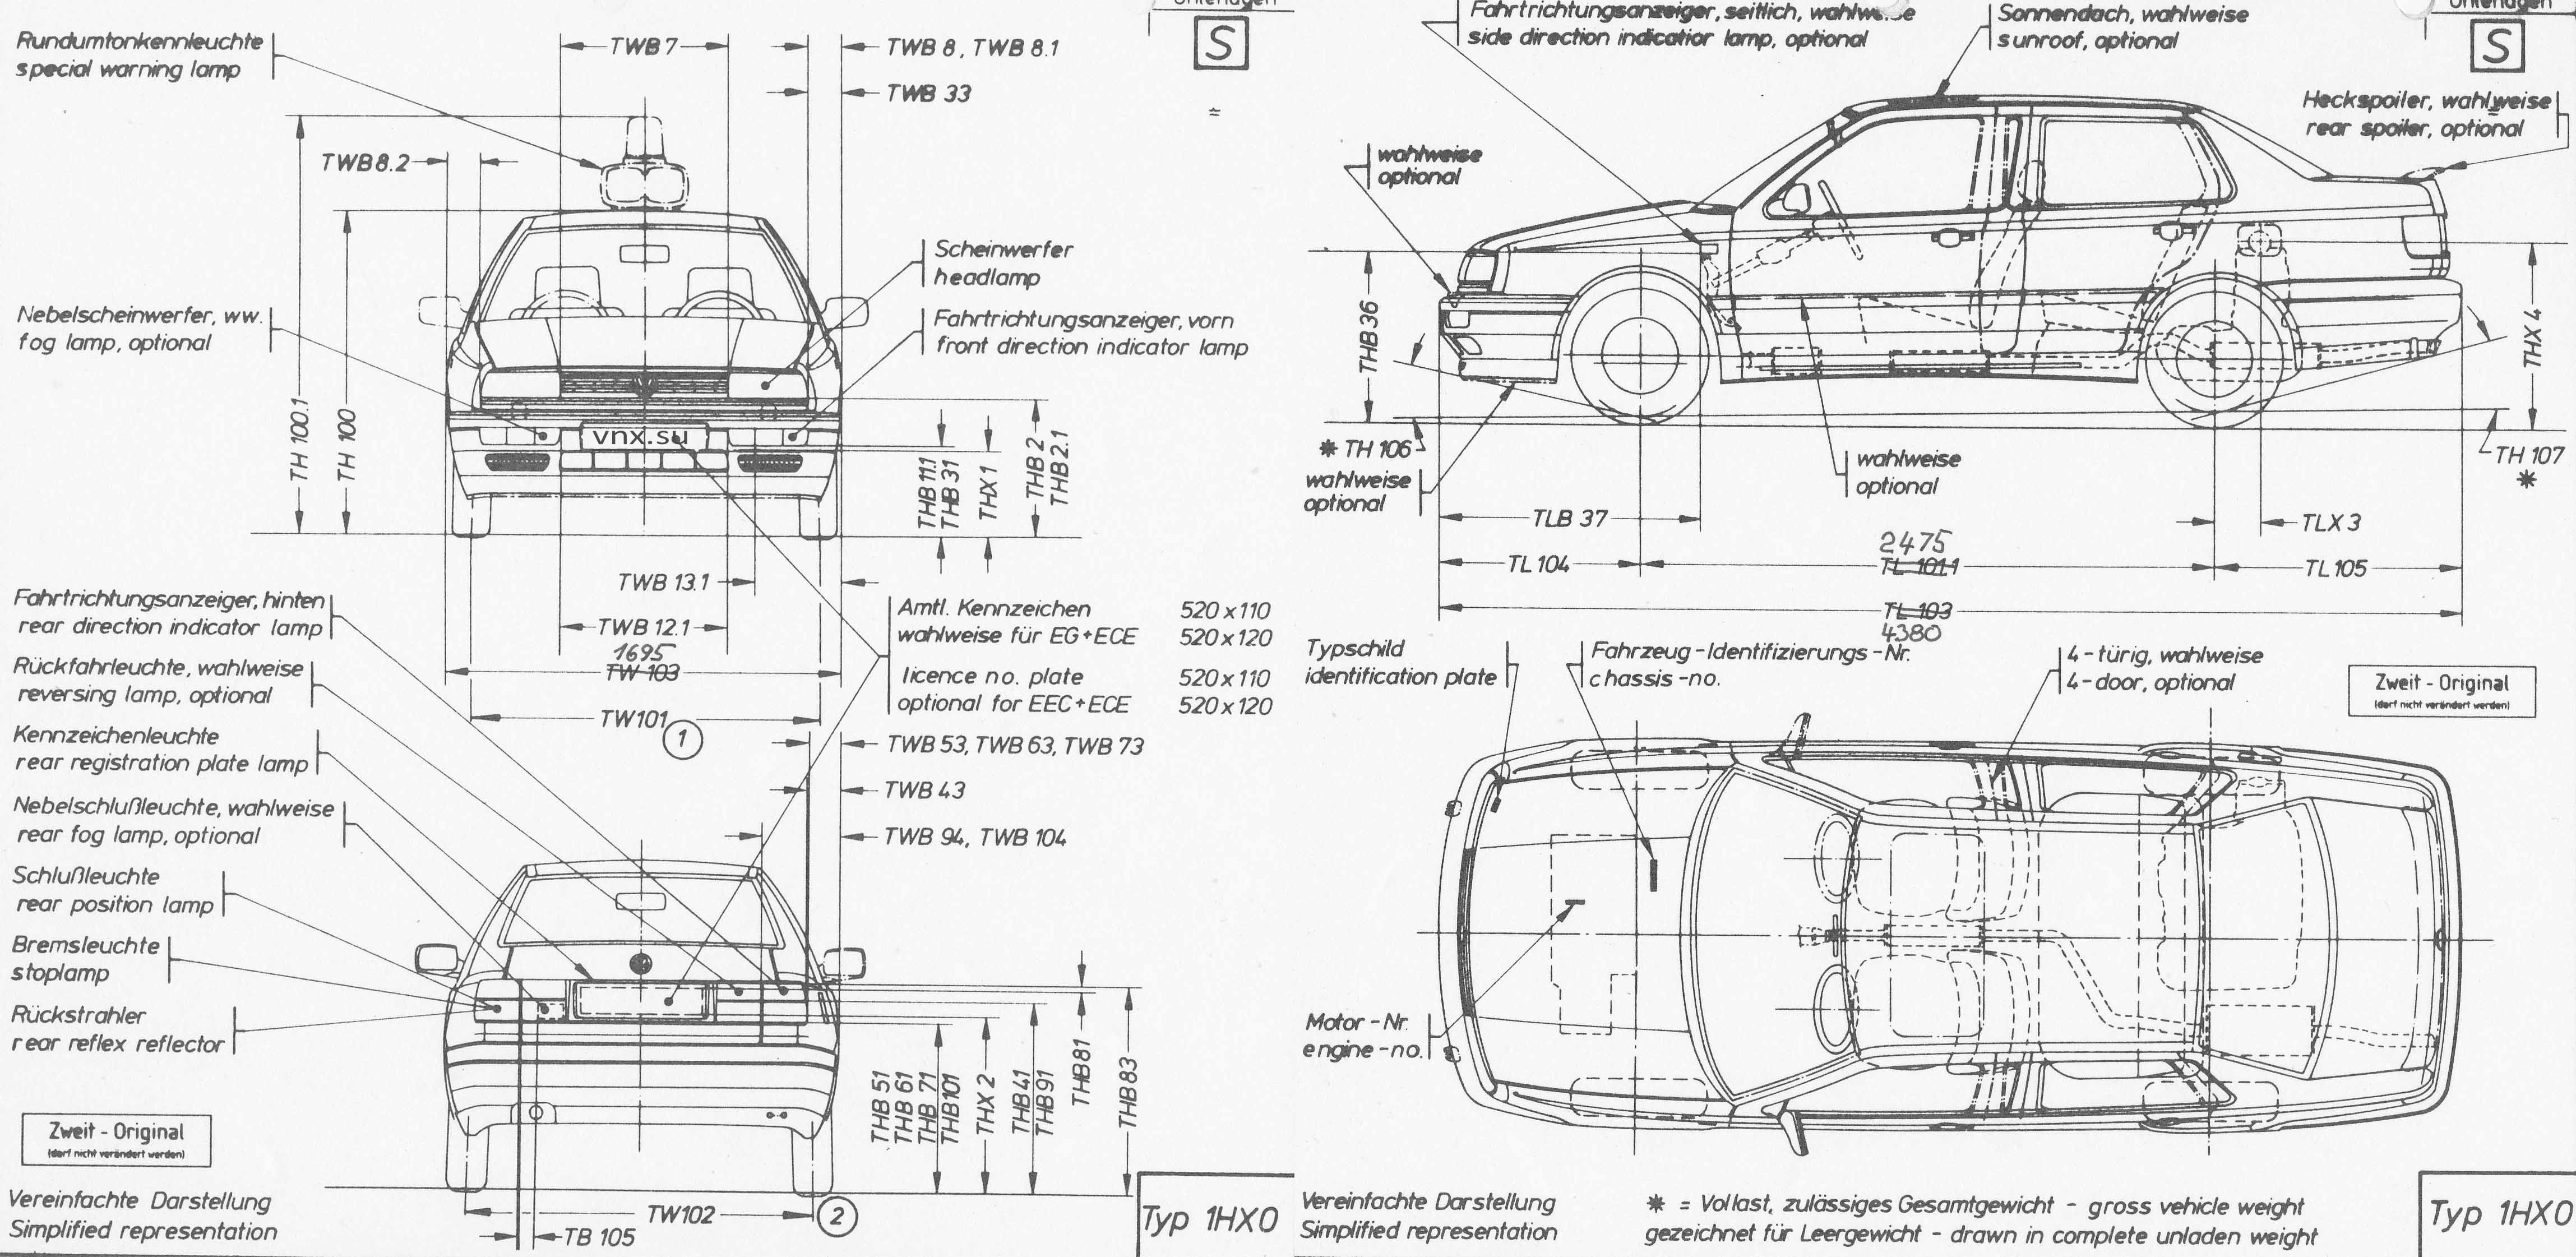 Габаритные размеры Фольксваген Венто 1991-1997 (dimensions VW Vento)